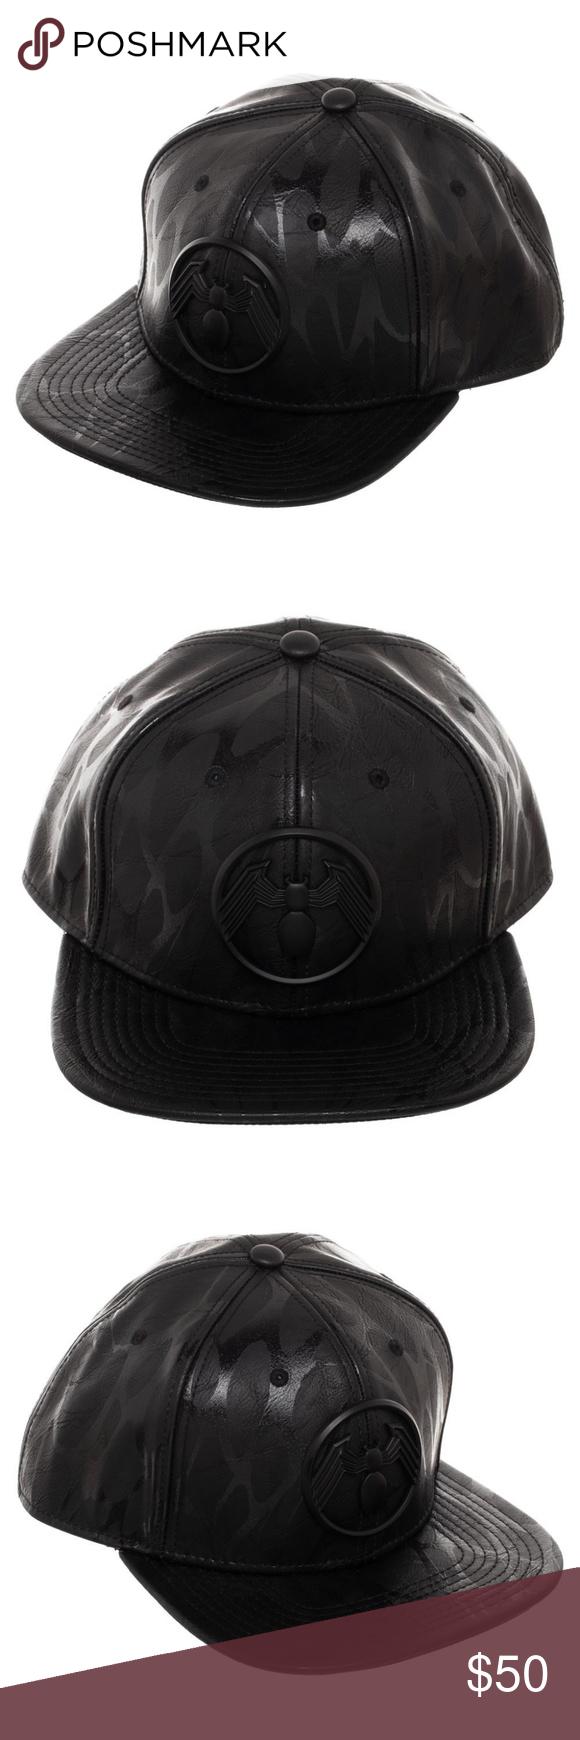 5a8c64f9 VENOM Snapback Hat Symbiote Marvel Comics Panels This is for 1 Venom themed  hat. Very